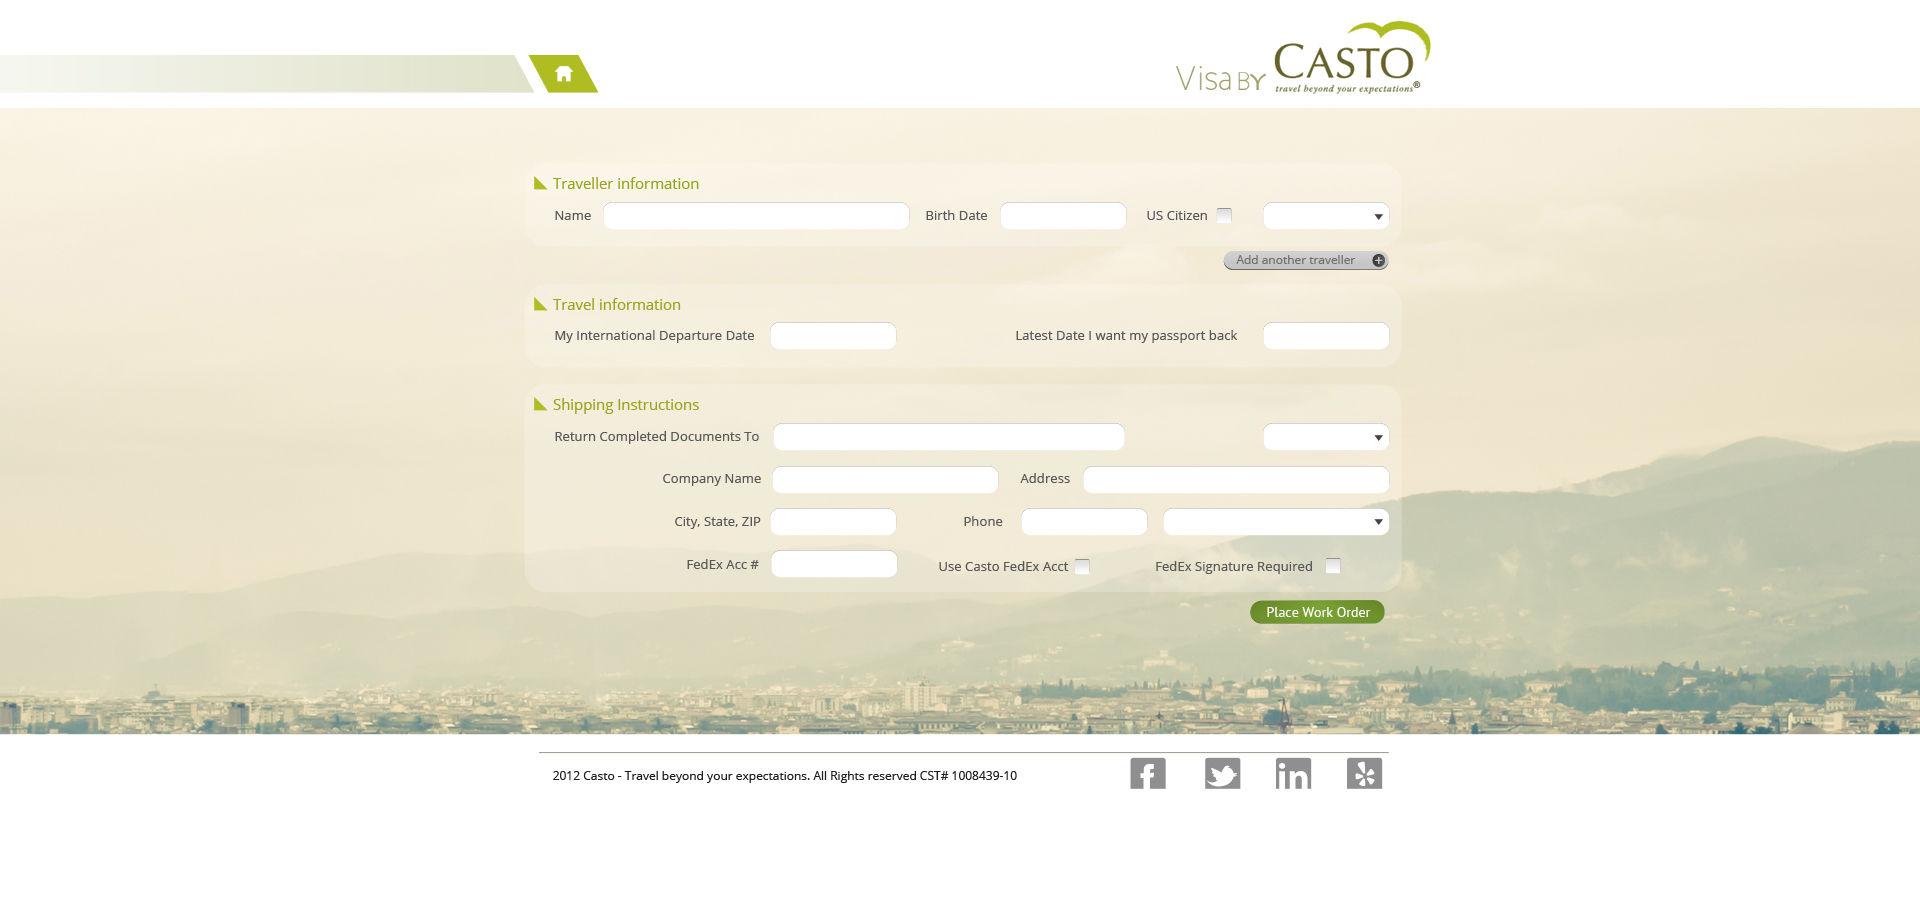 Visa by visa by casto home screenshot